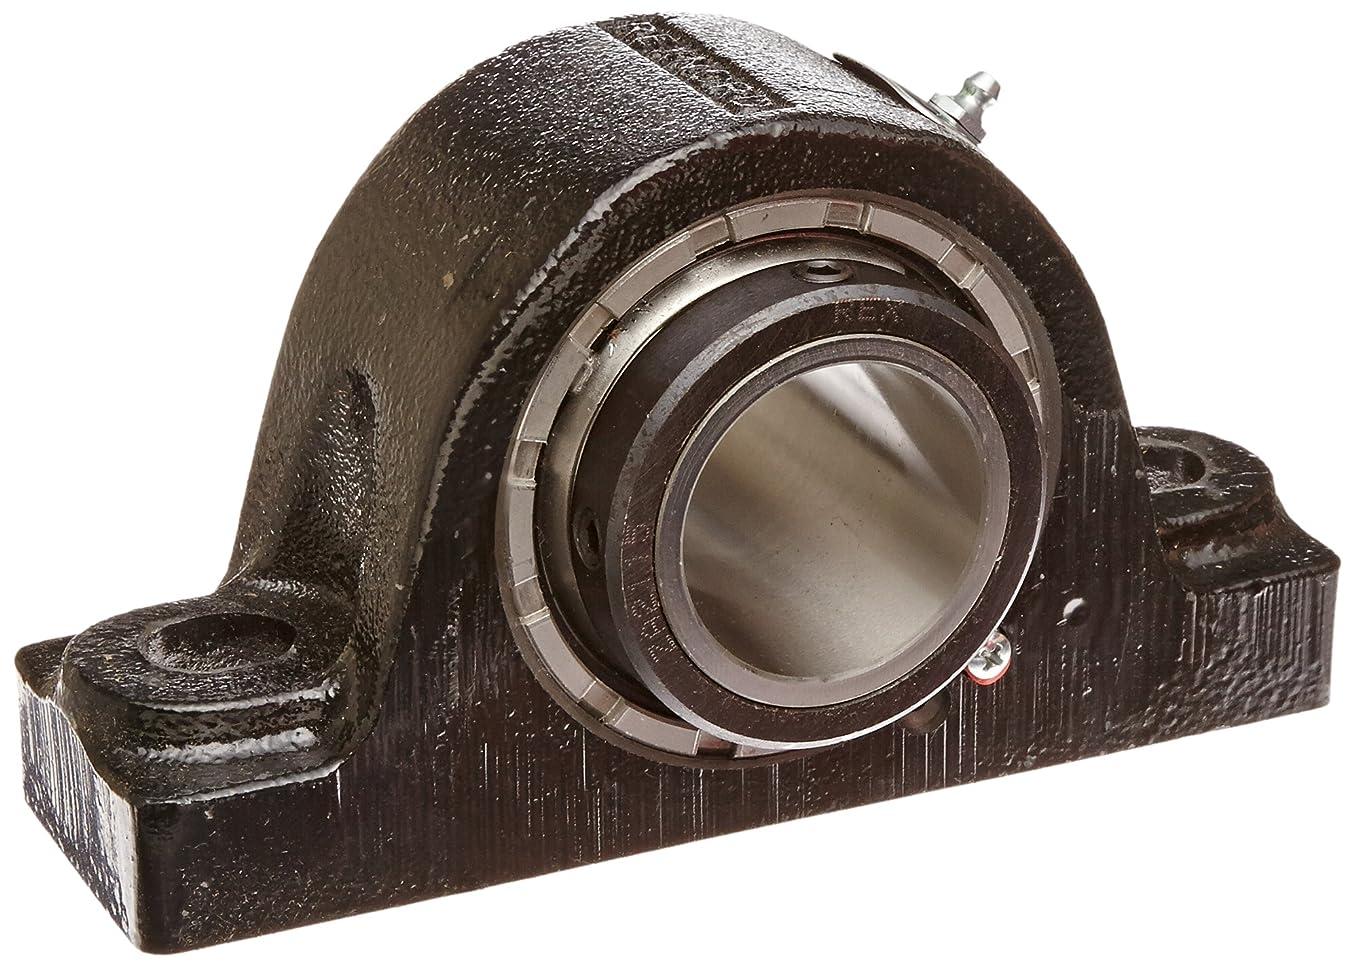 Rexnord ZA2115 Roller Bearing Pillow Block, 2 Bolt Holes, Relubricatable, Non-Expansion, Cast Iron, Setscrew Locking Collar, Steel Insert, Inch, 1-15/16